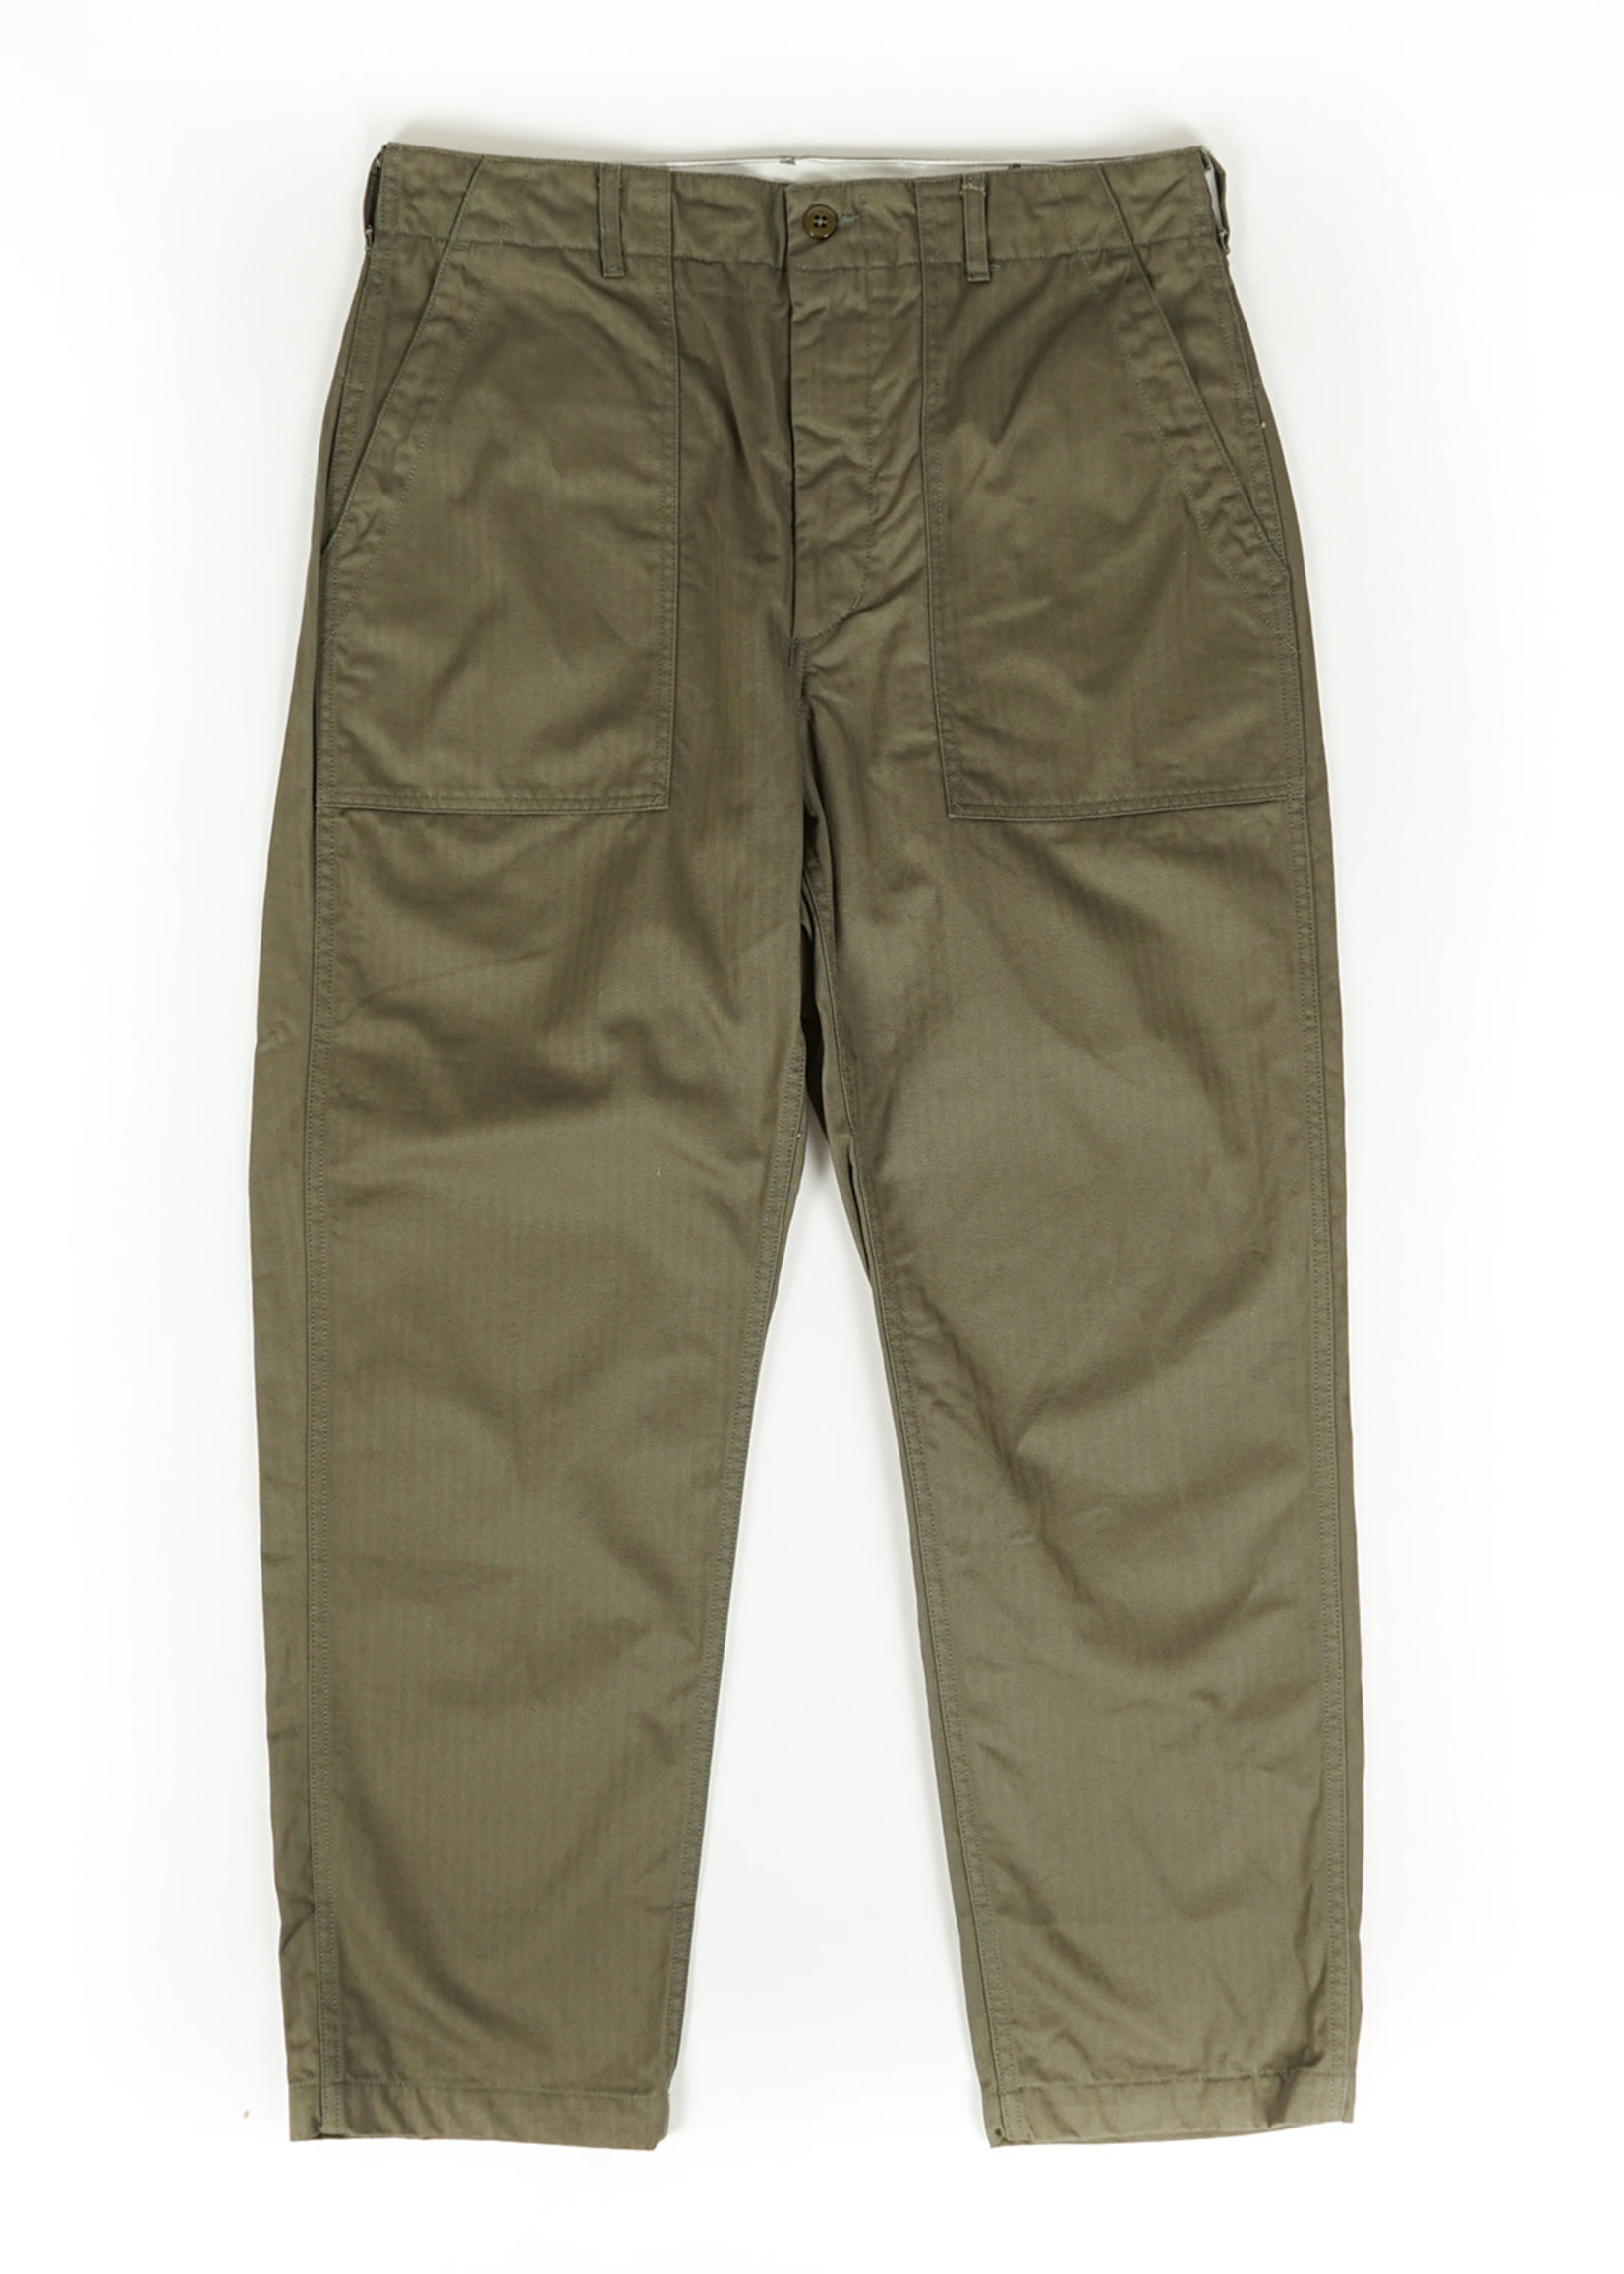 Engineered Garments  Engineered Garments Fatigue Pant Olive Cotton Herringbone Twill